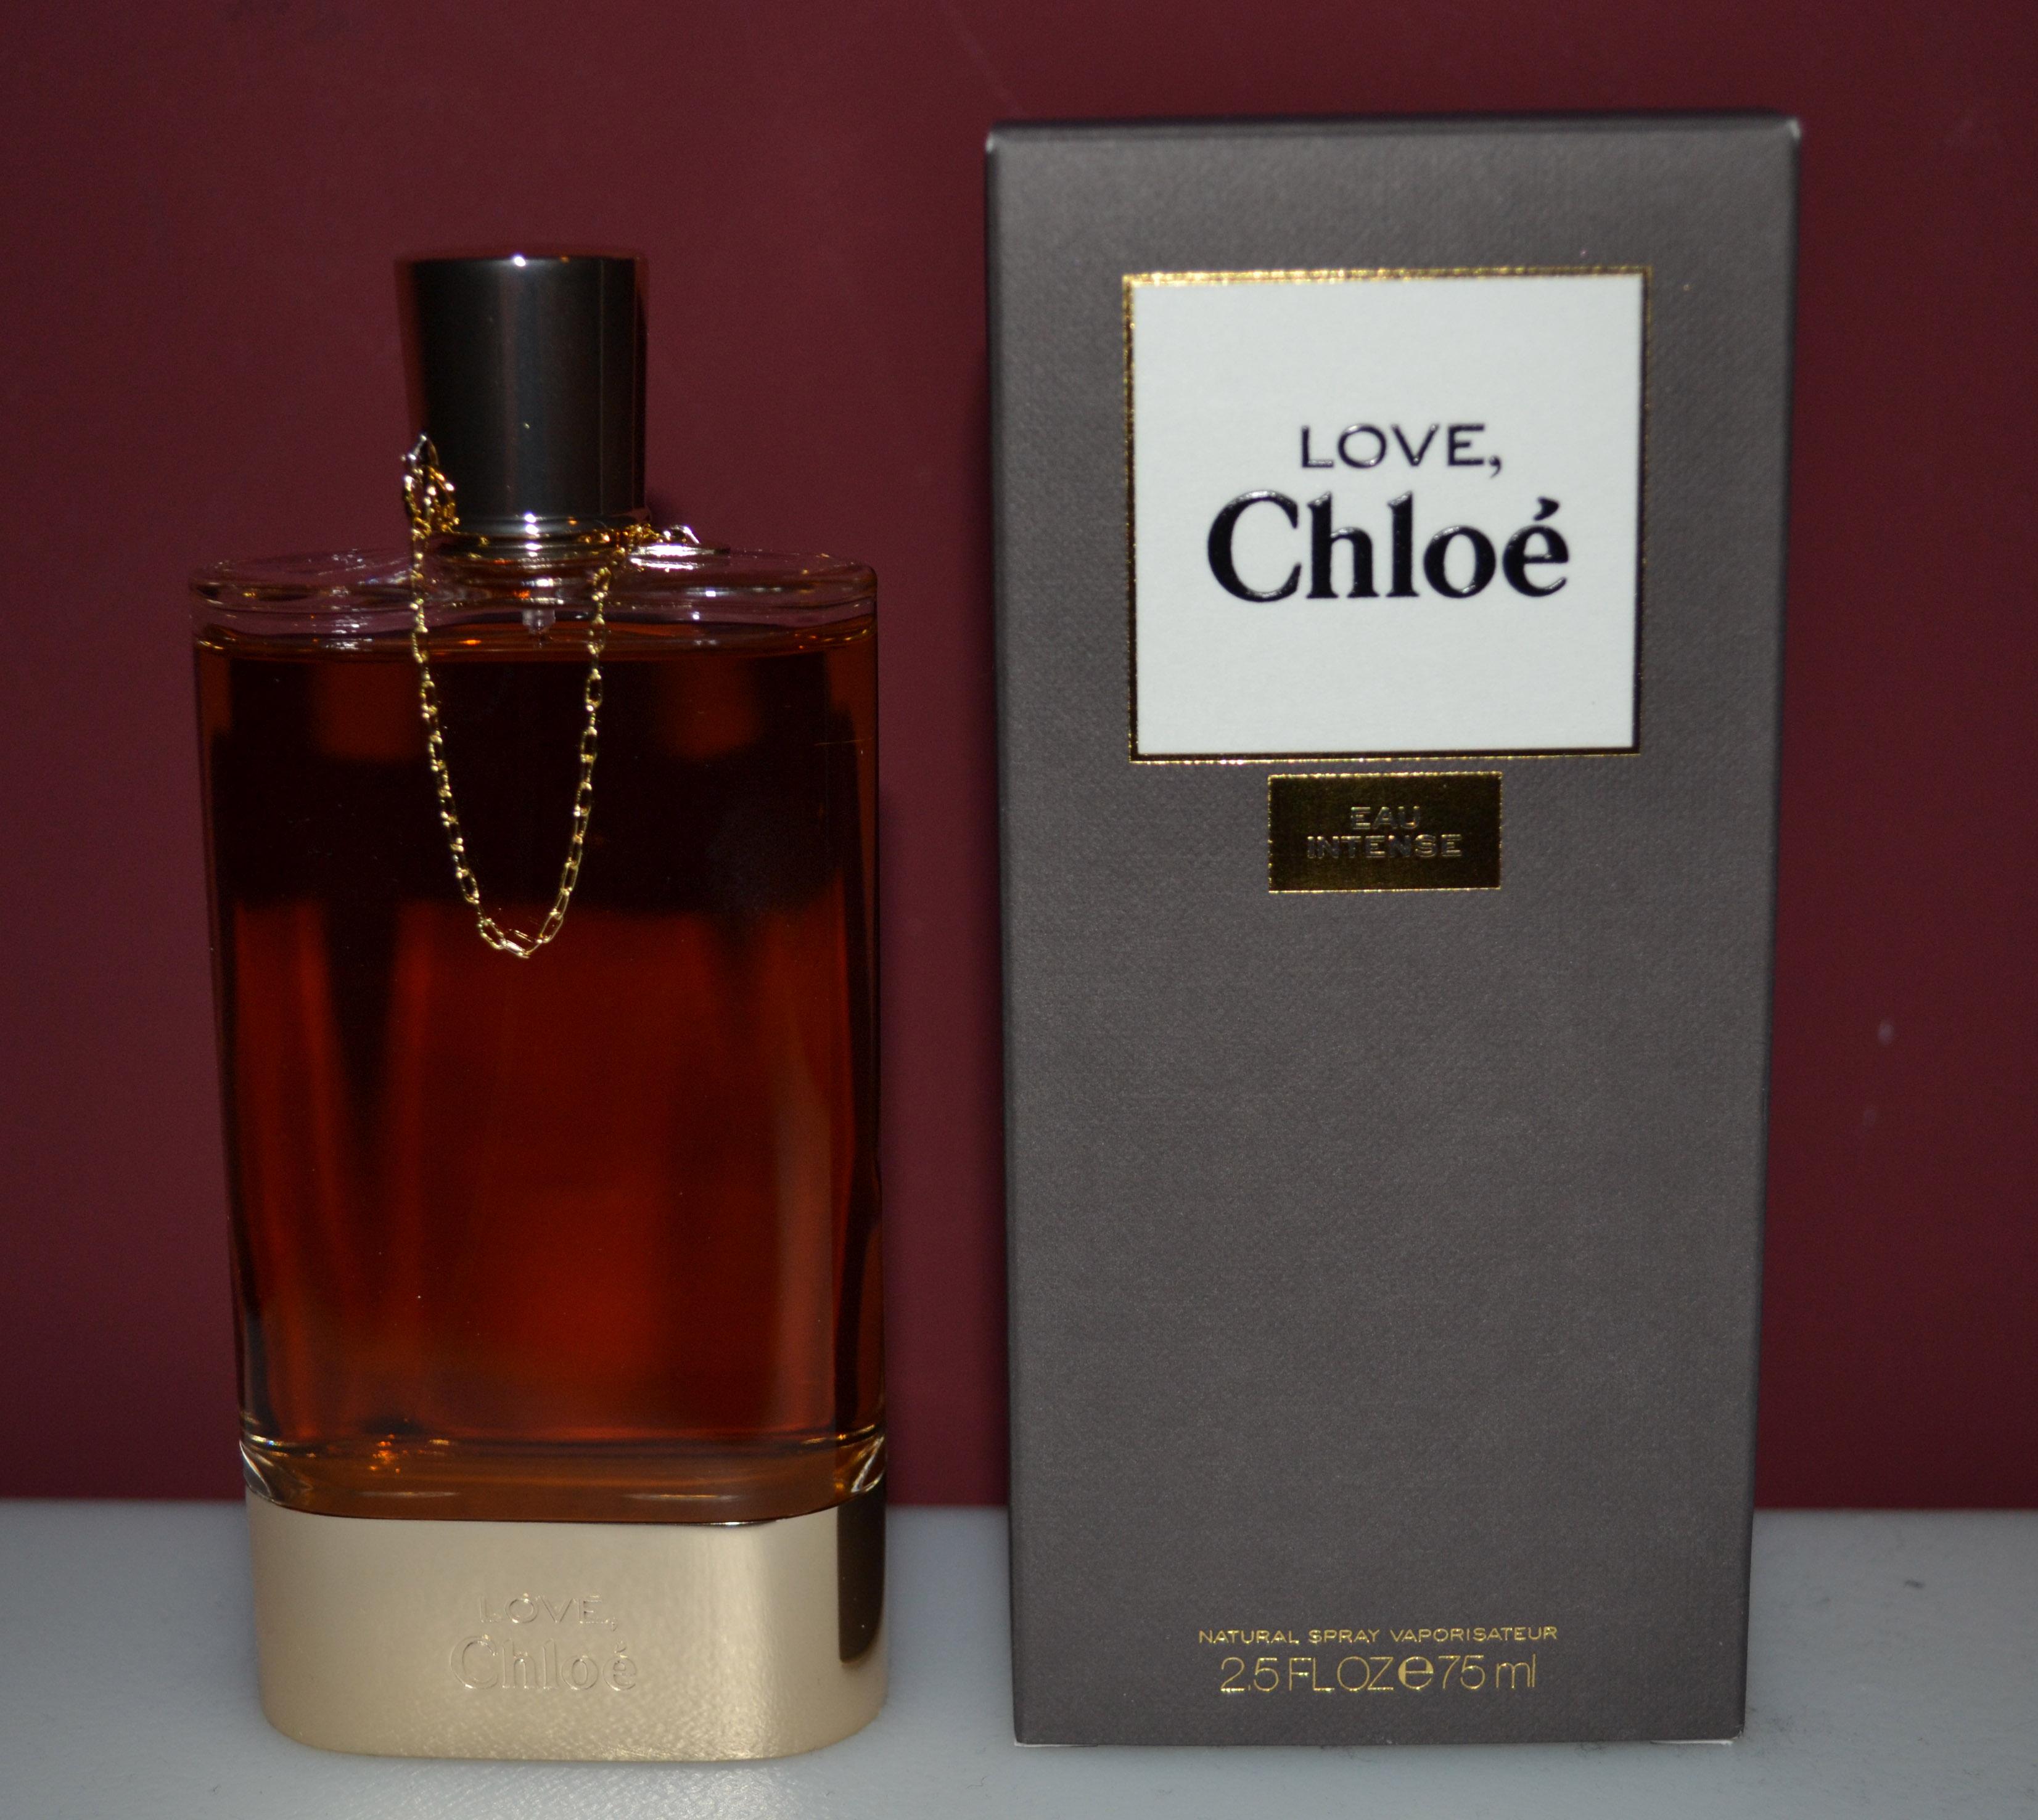 Love Love Love Eau Chloé Chloé Eau IntenseLacedinleather IntenseLacedinleather Eau IntenseLacedinleather Love Chloé dxBoeWrC